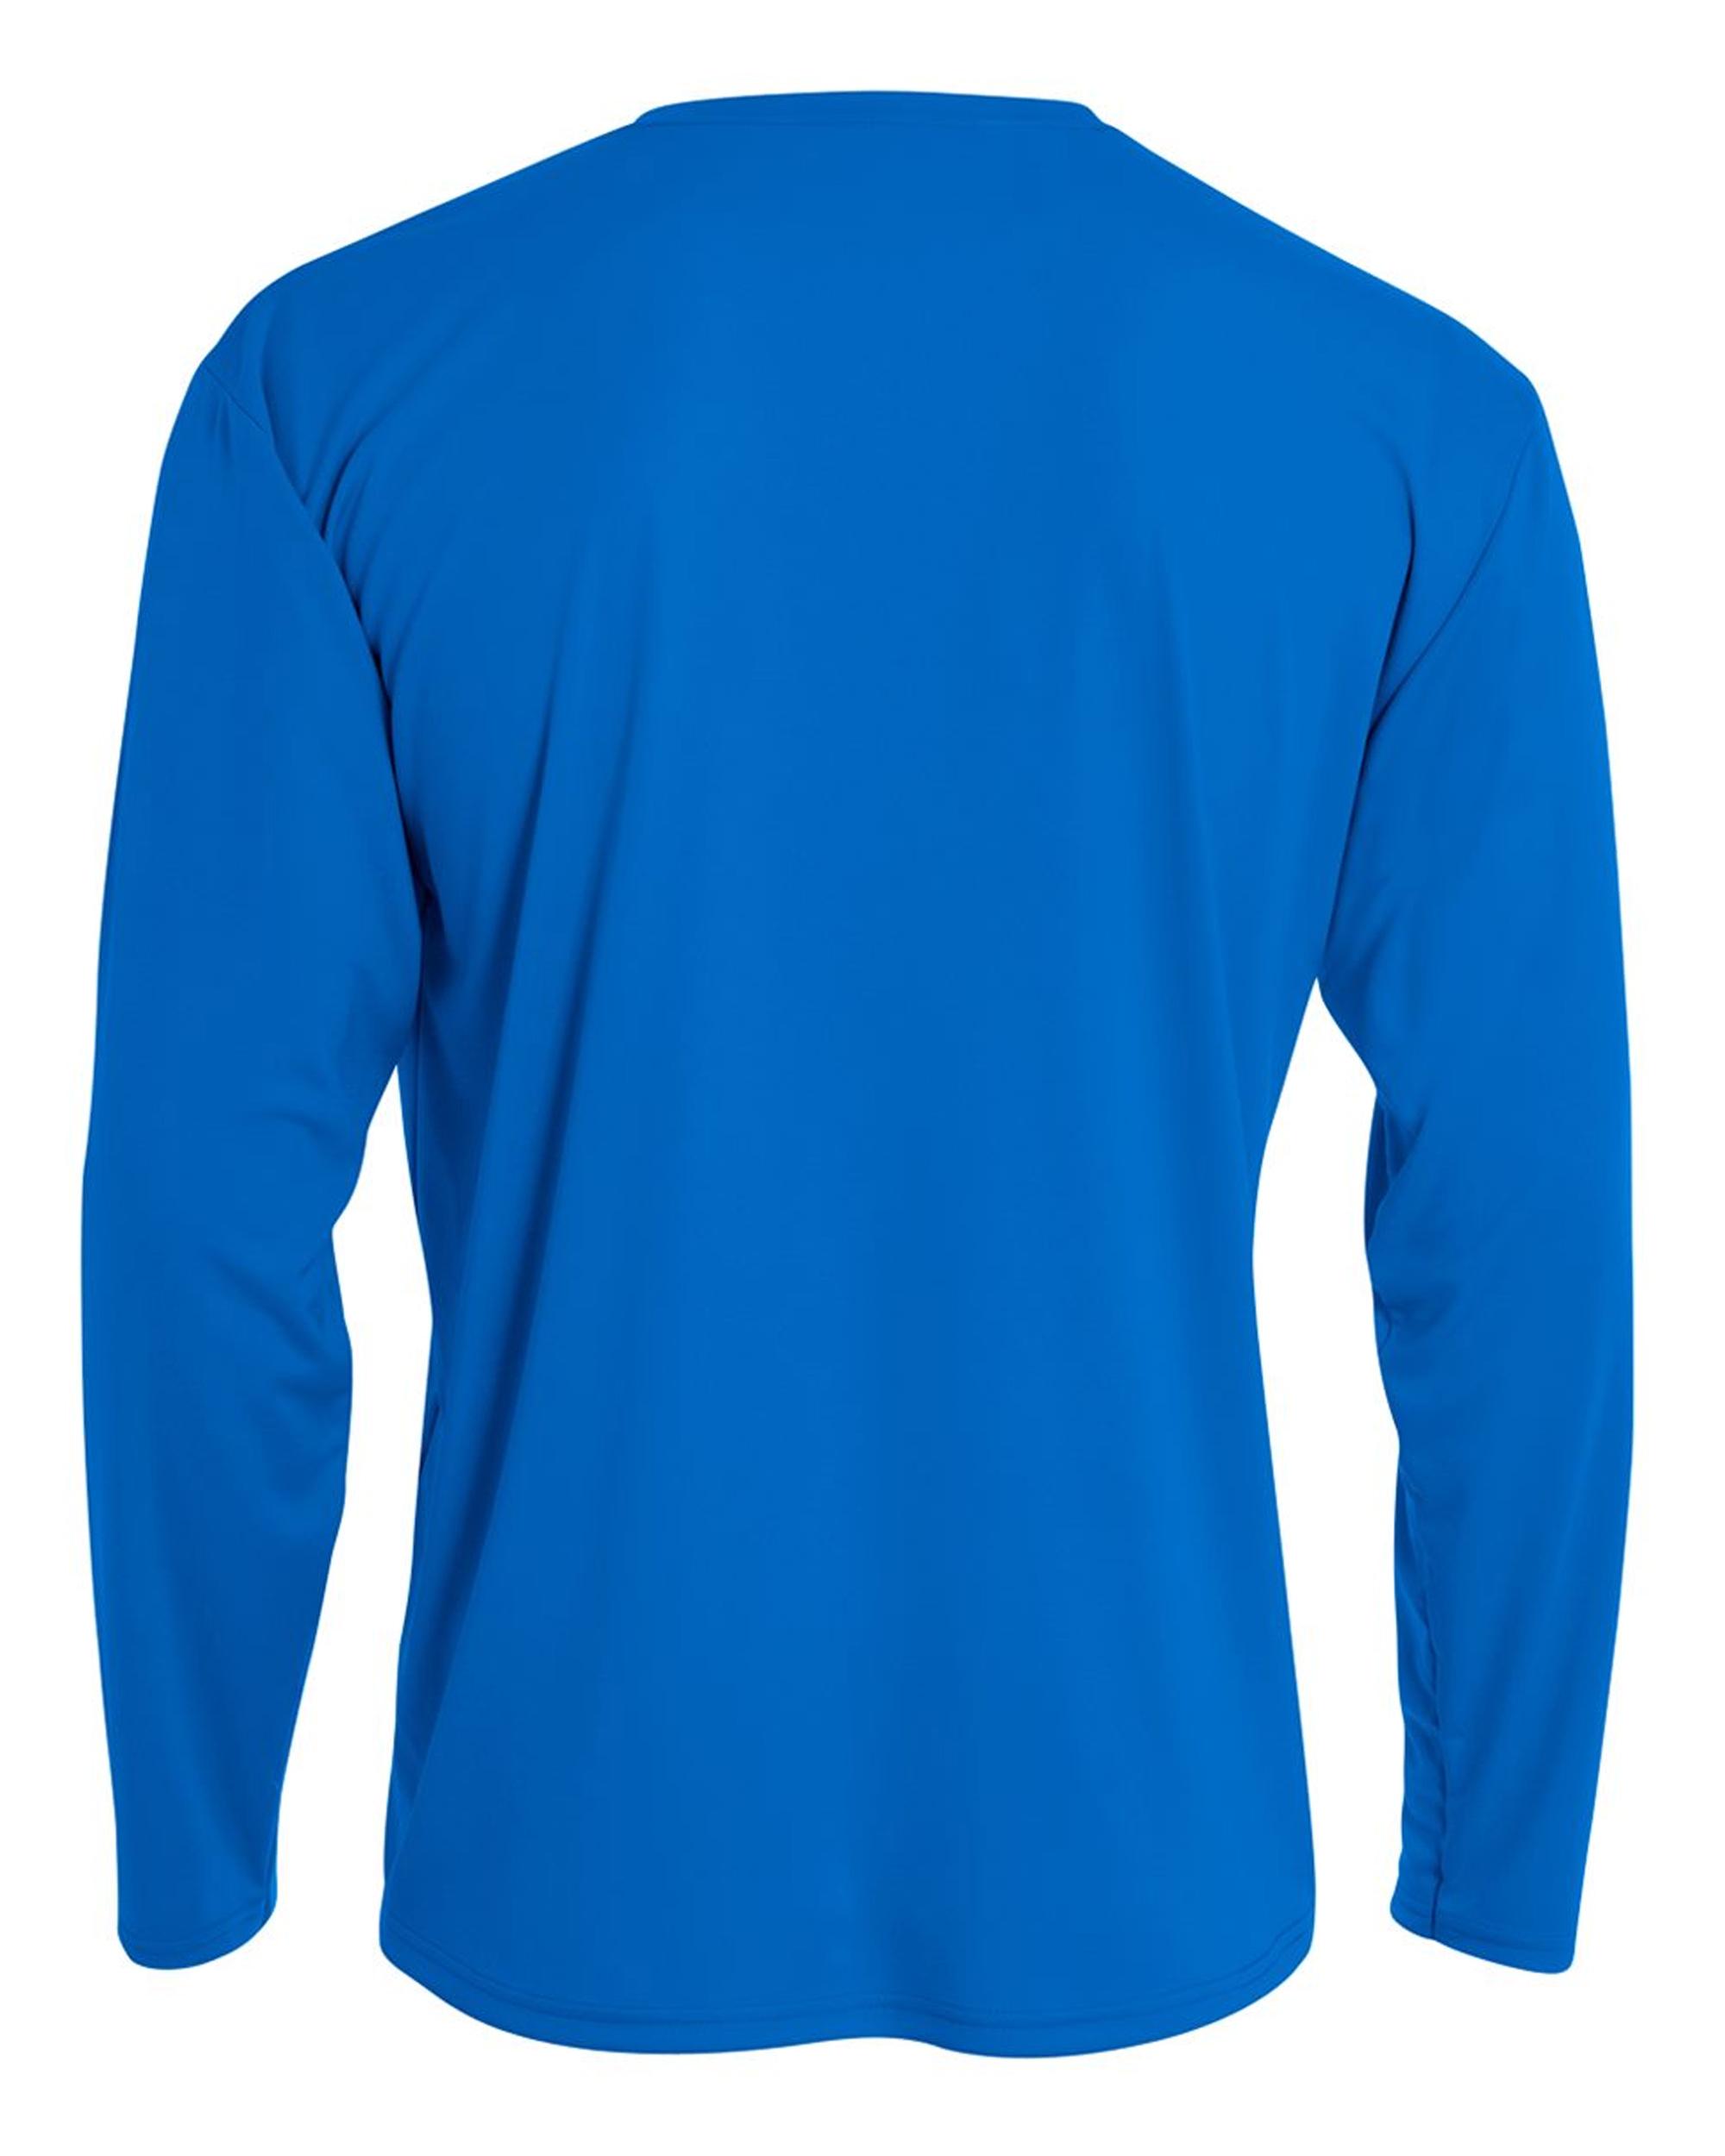 Men-039-s-Long-Sleeve-Loose-Fit-Rash-Guard-Surf-Shirt-Water-Sports-Swimwear thumbnail 16